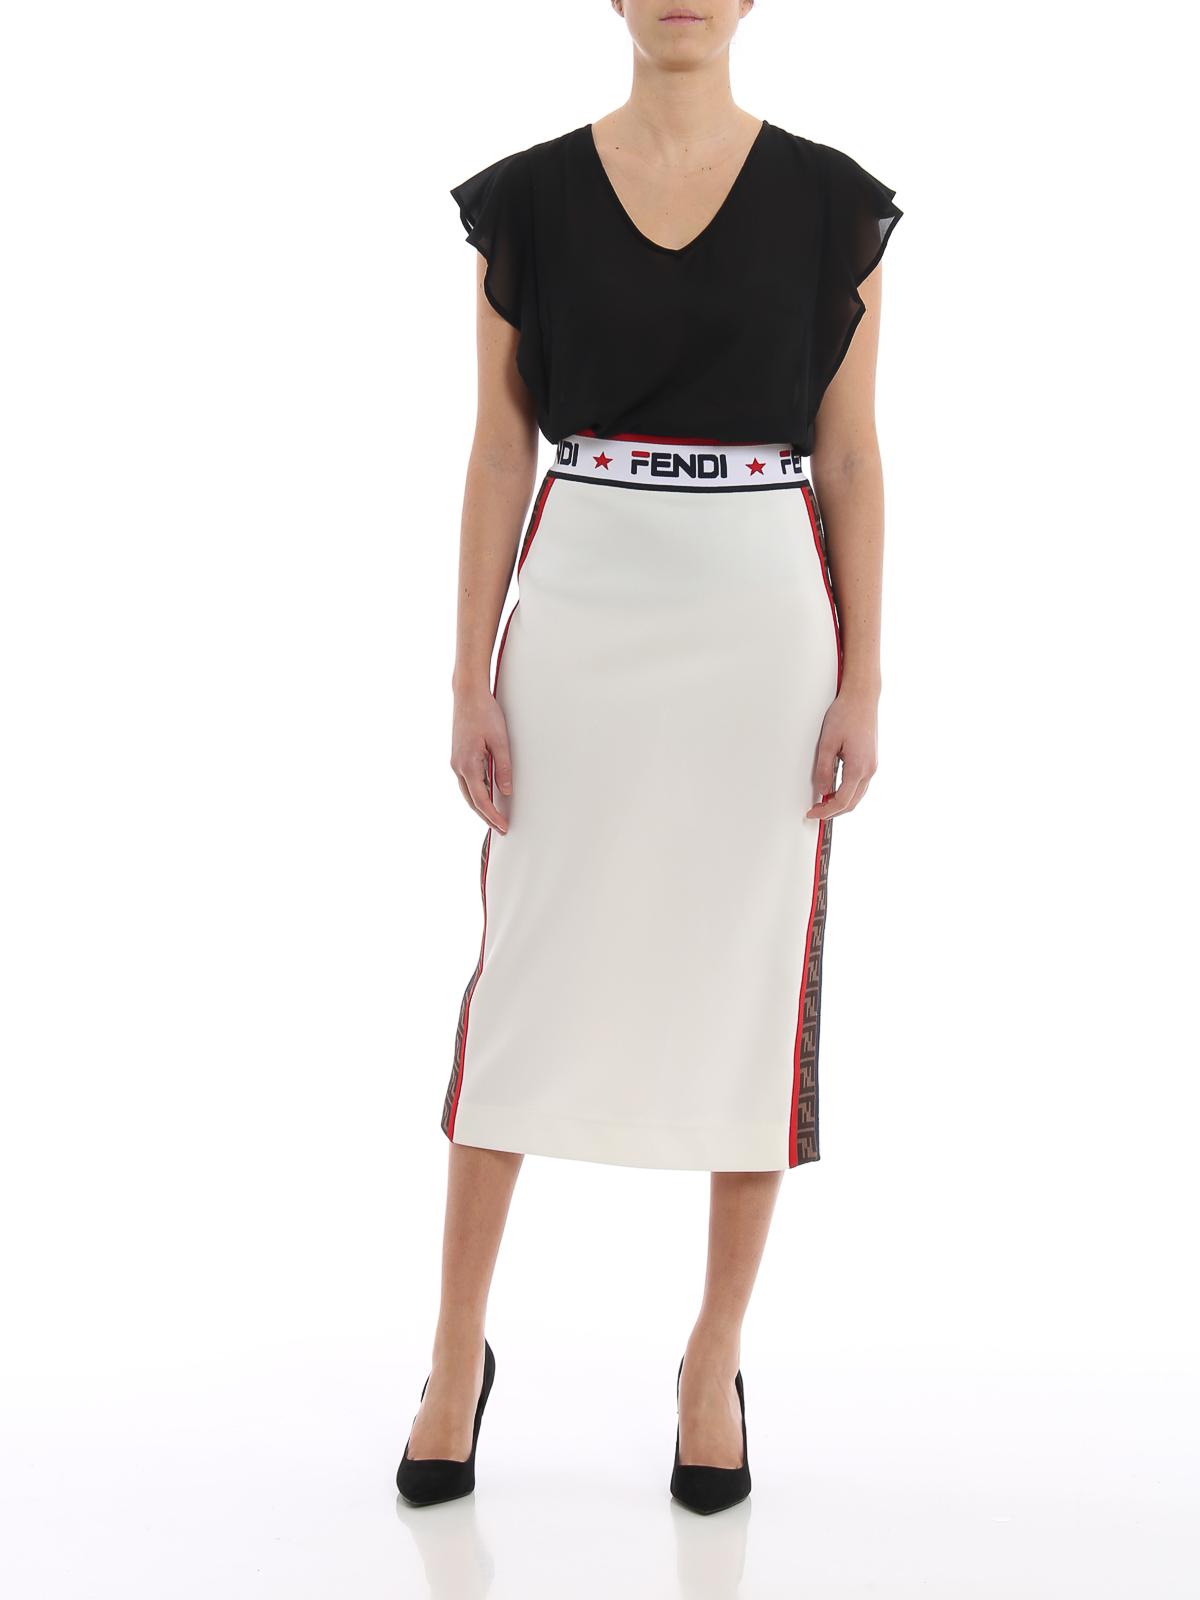 3a6243b18 FENDI: Knee length skirts & Midi online - Fendi Mania tech piqué jersey  pencil skirt